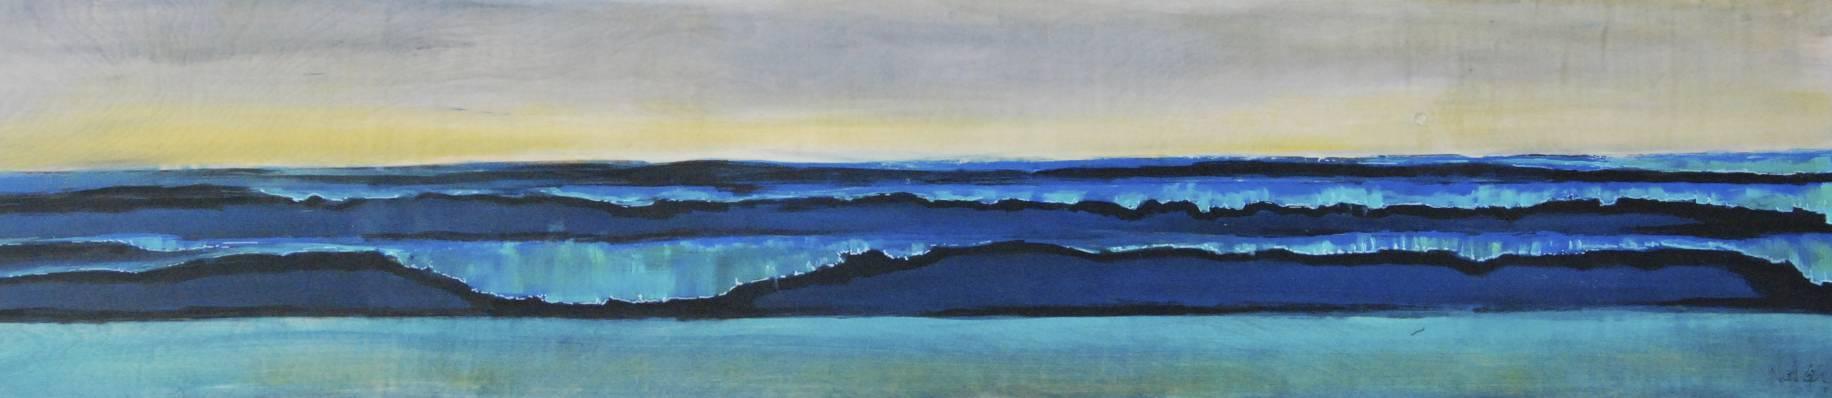 A Long Way away on the Blue Horizon.jpg